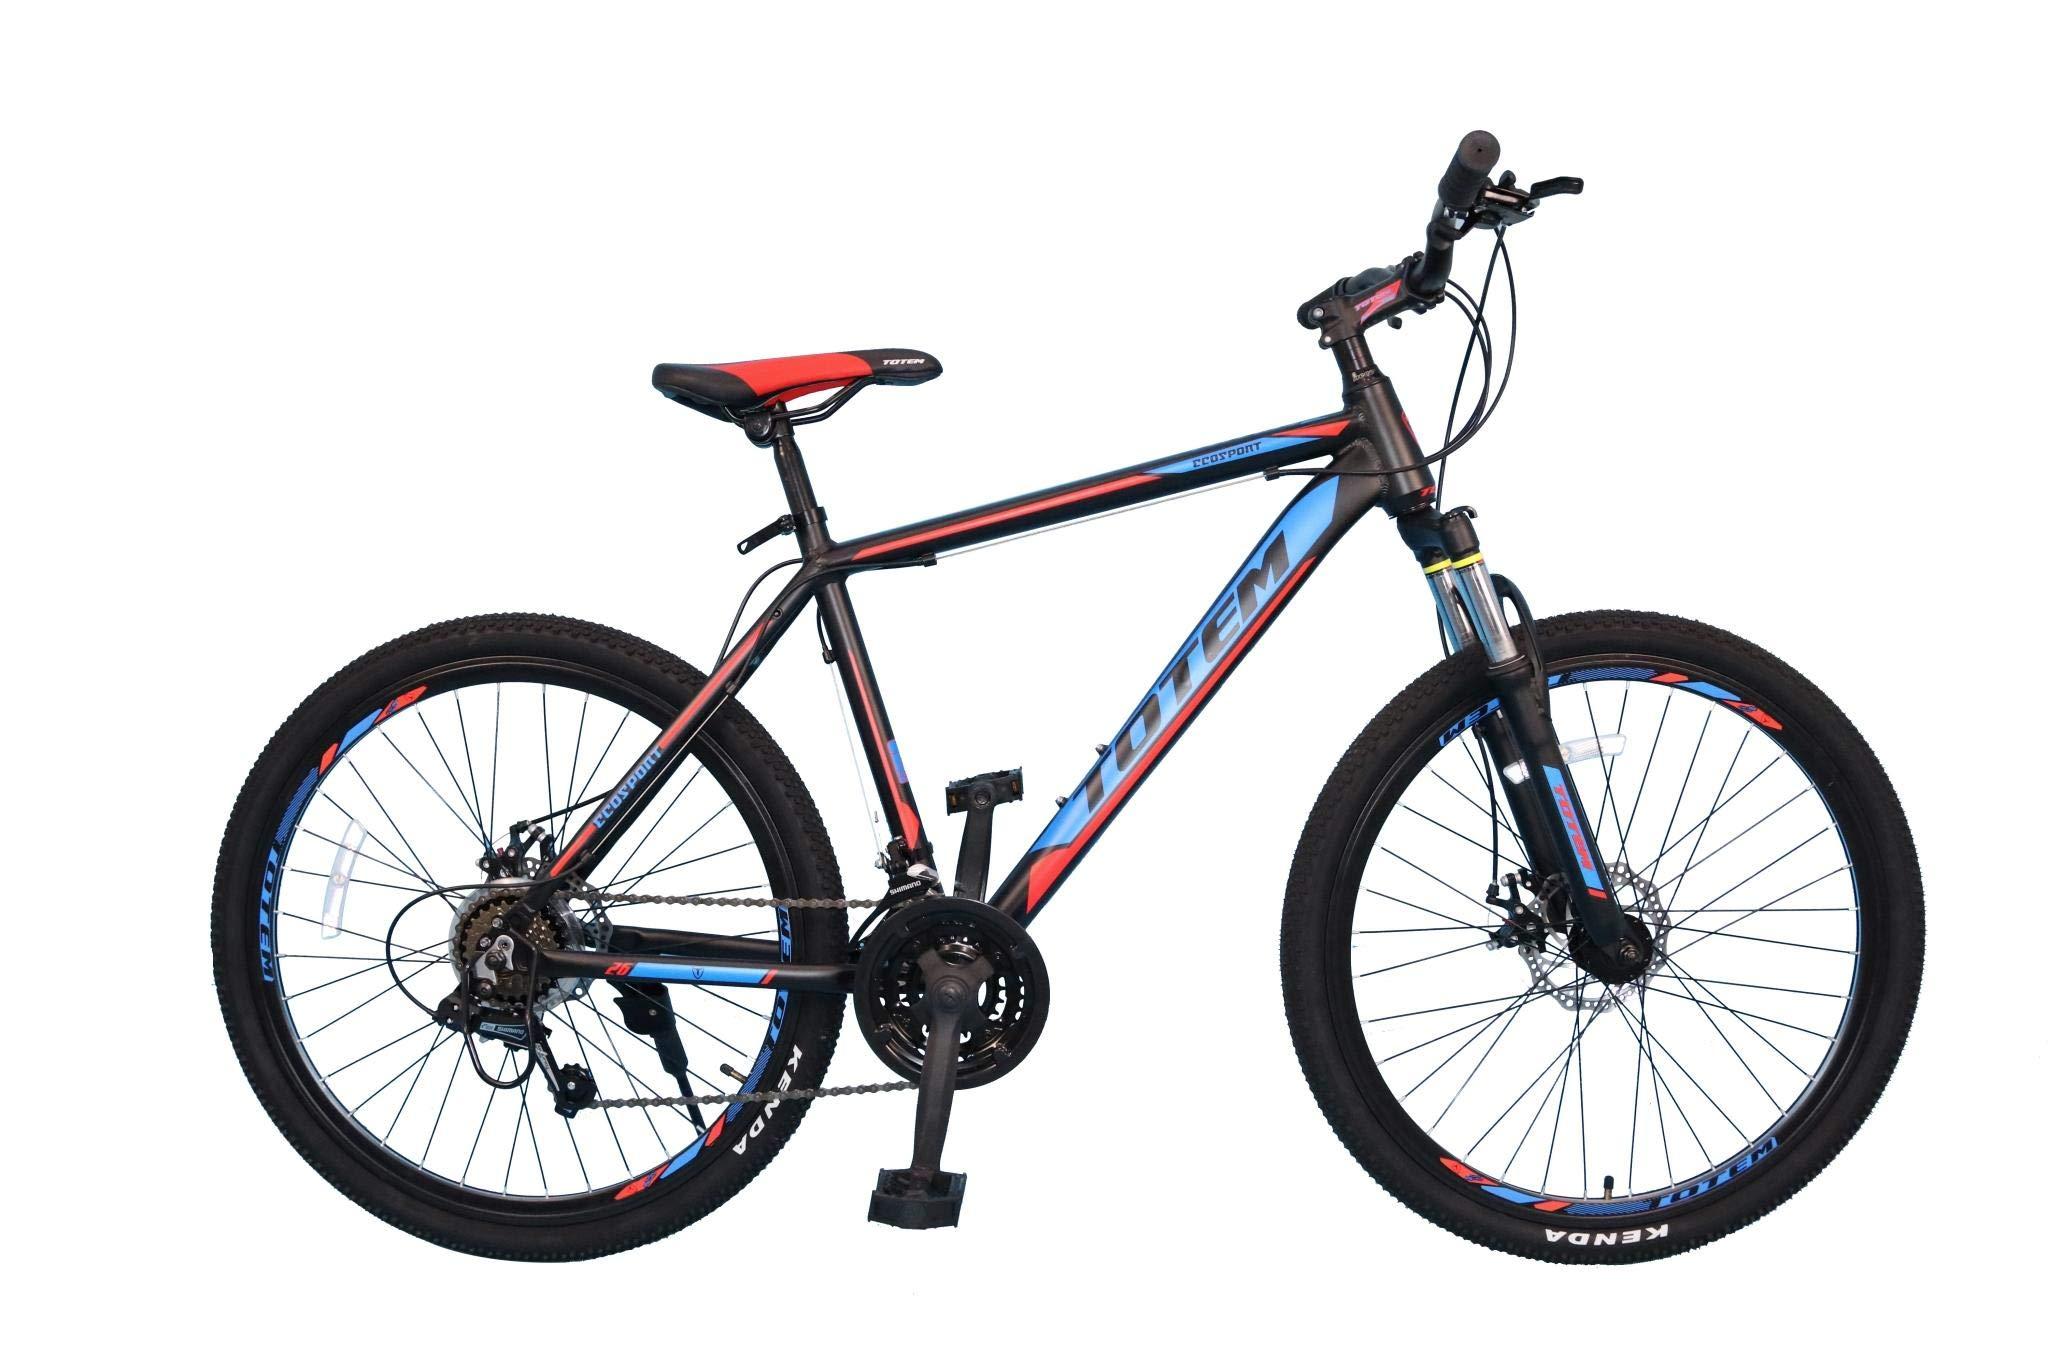 1ad01d4193b TOTEM-Aluminum Mountain Bike Shimano ST-EF500-26Inch Price in UAE ...